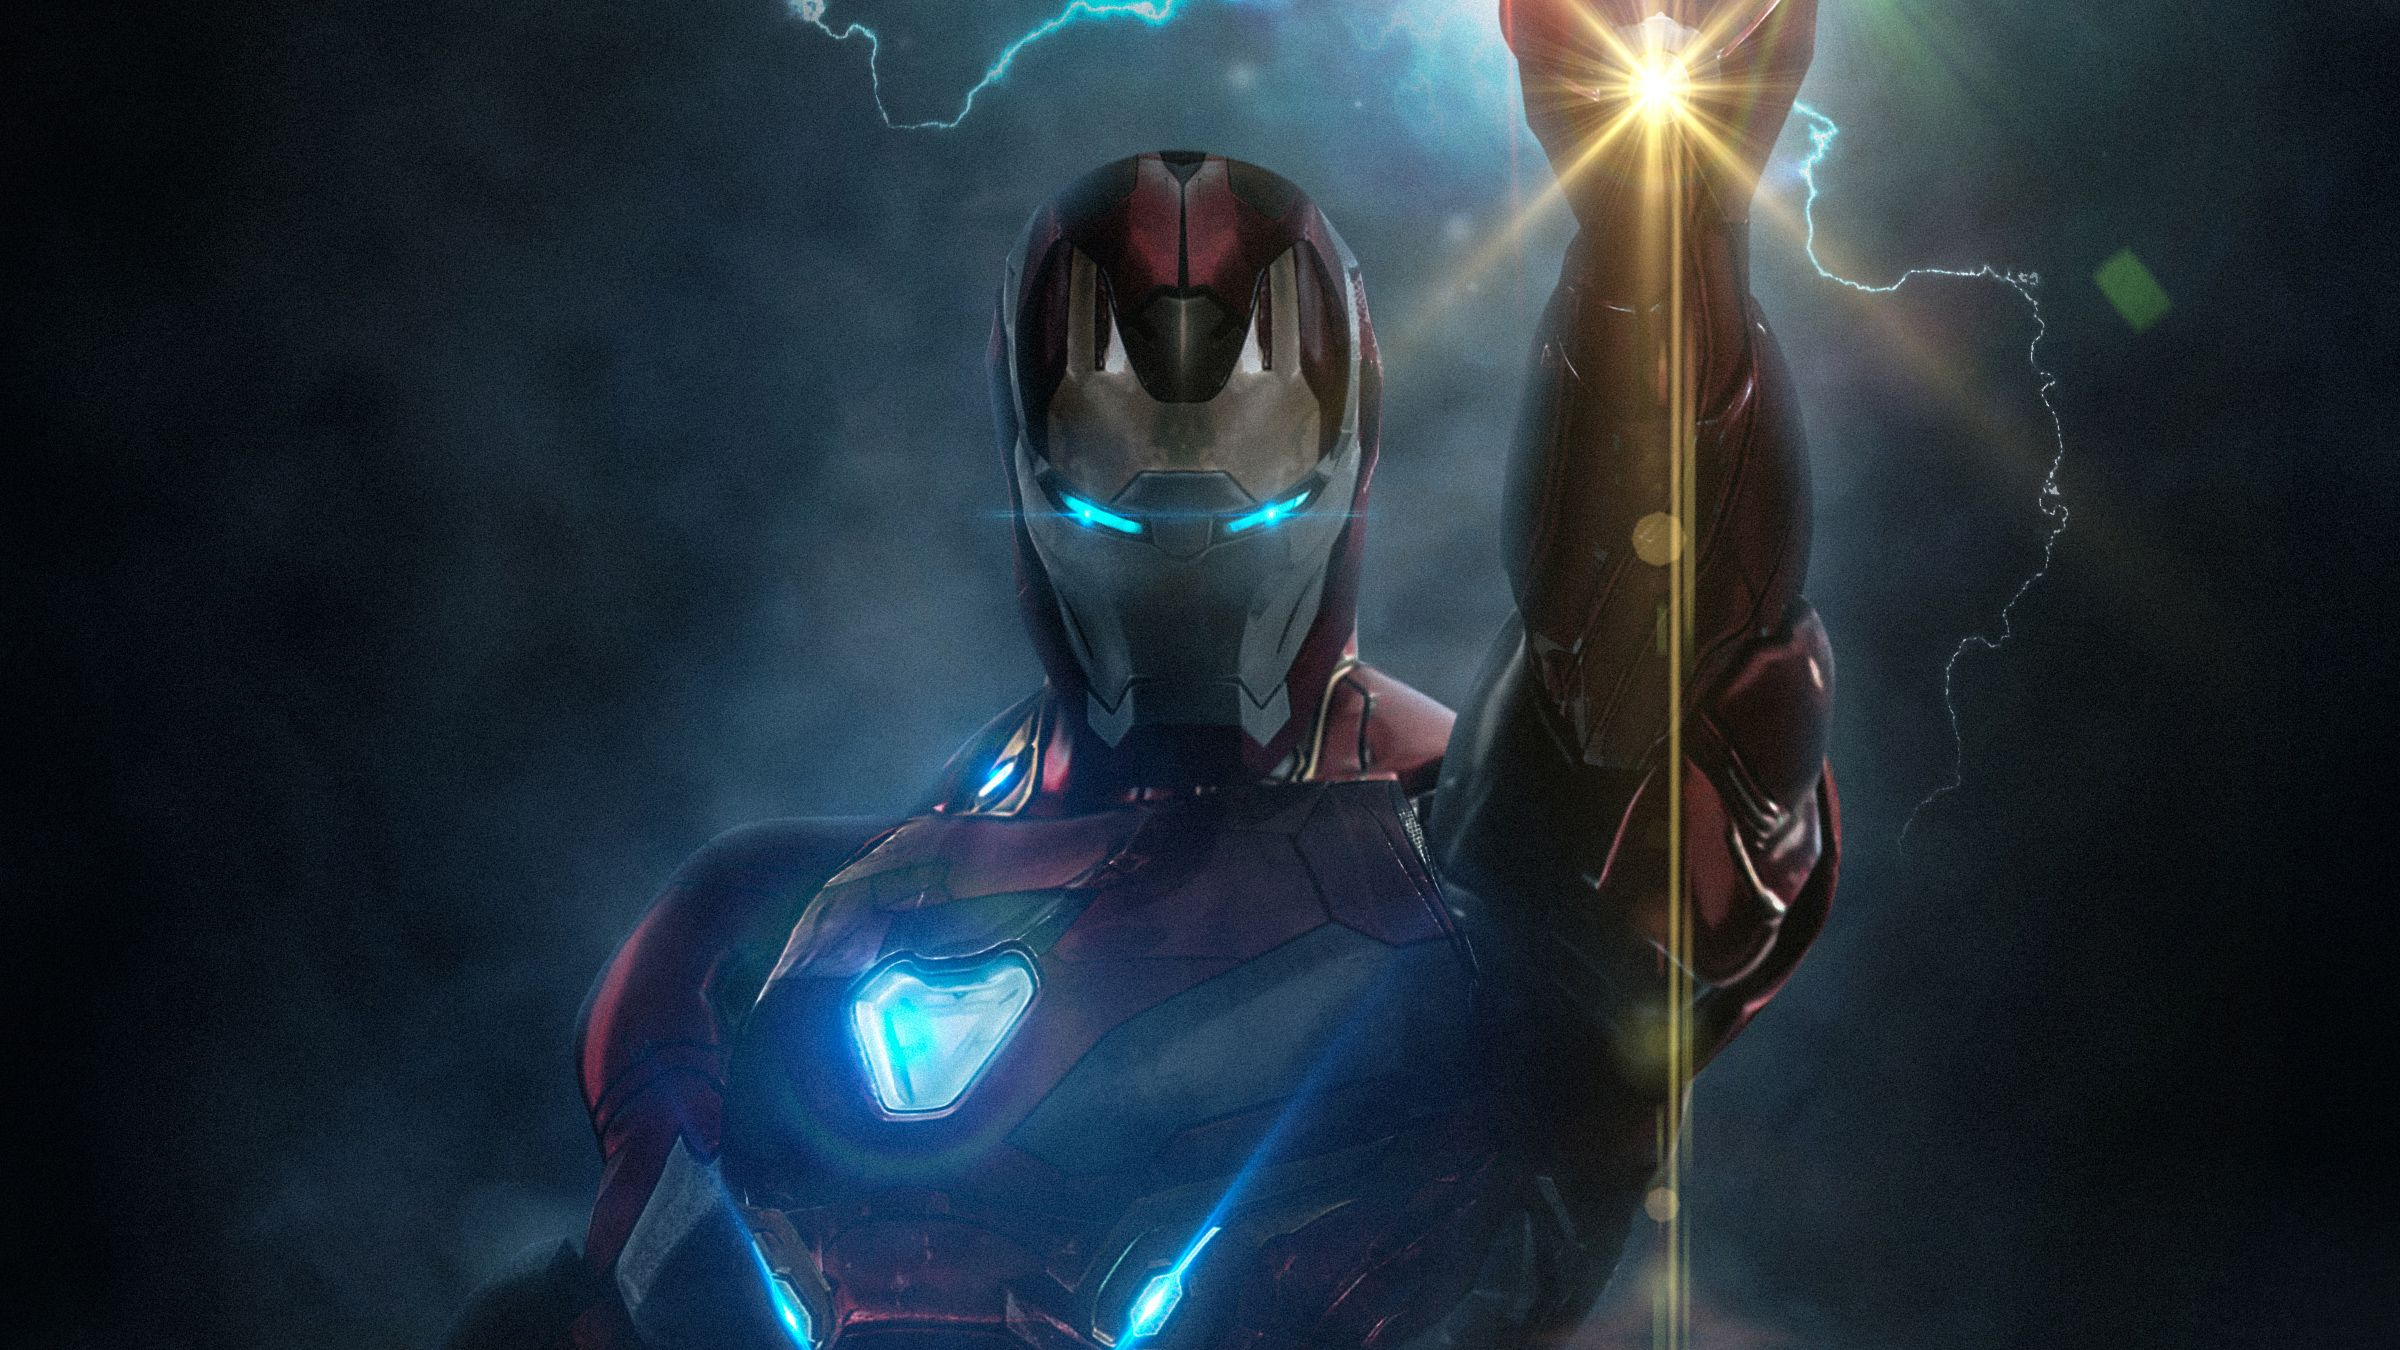 Iron Man Endgame Hd Wallpapers Top Free Iron Man Endgame Hd Backgrounds Wallpaperaccess